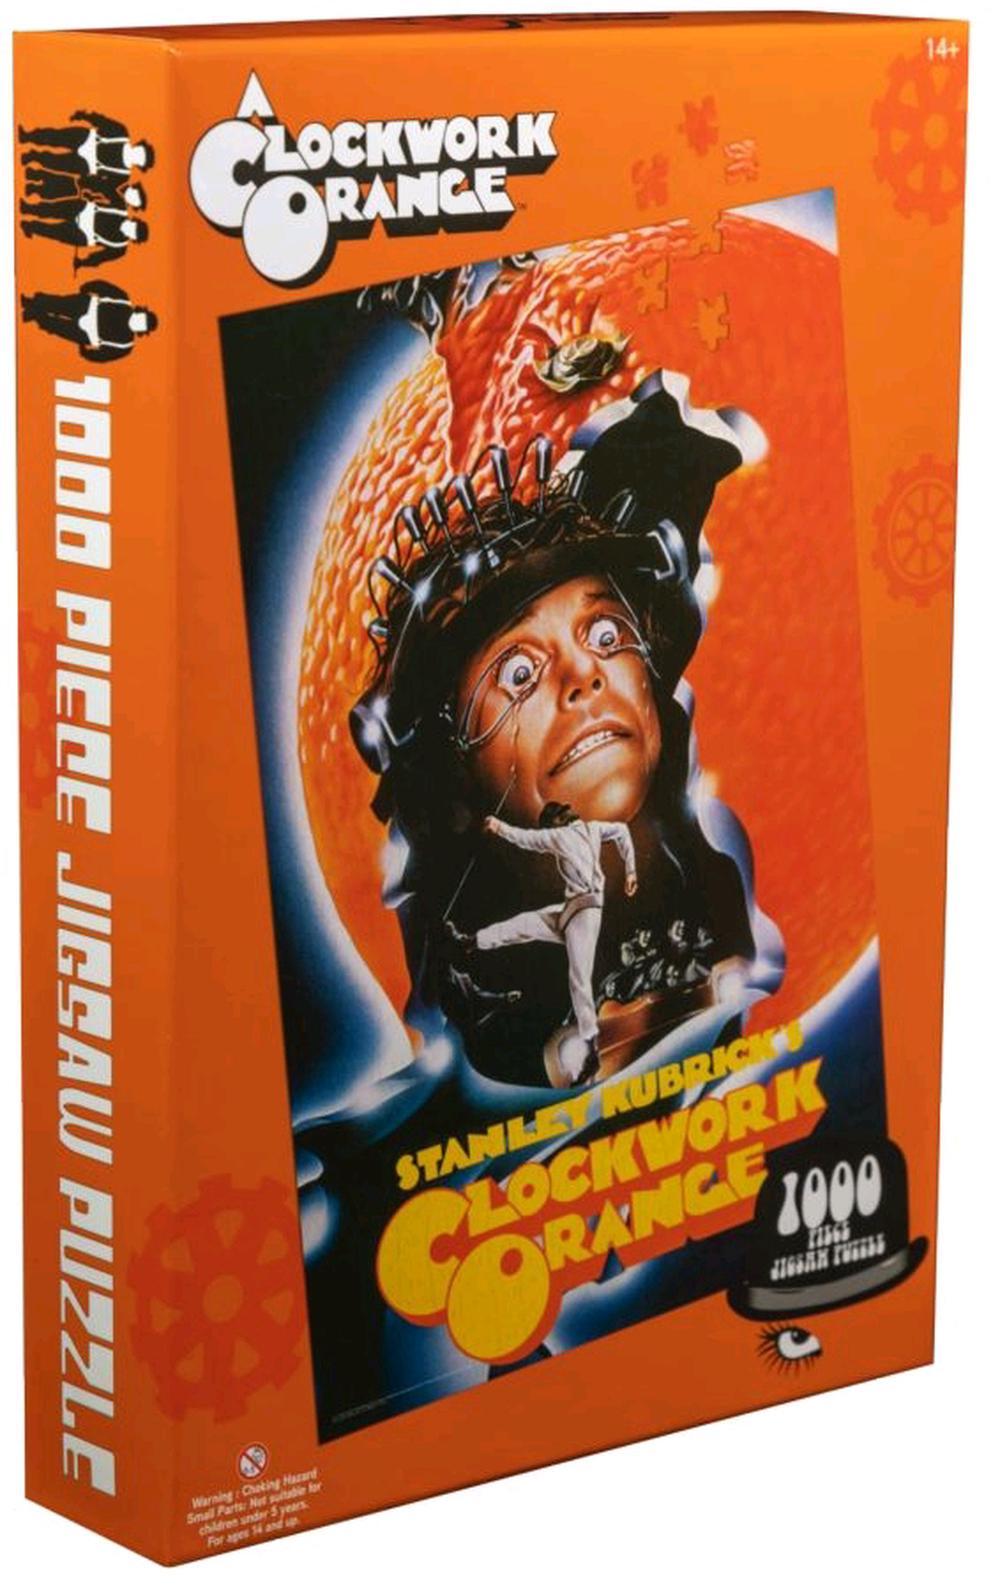 A Clockwork Orange - Kubrick Poster 1000 Piece Jigsaw Puzzle